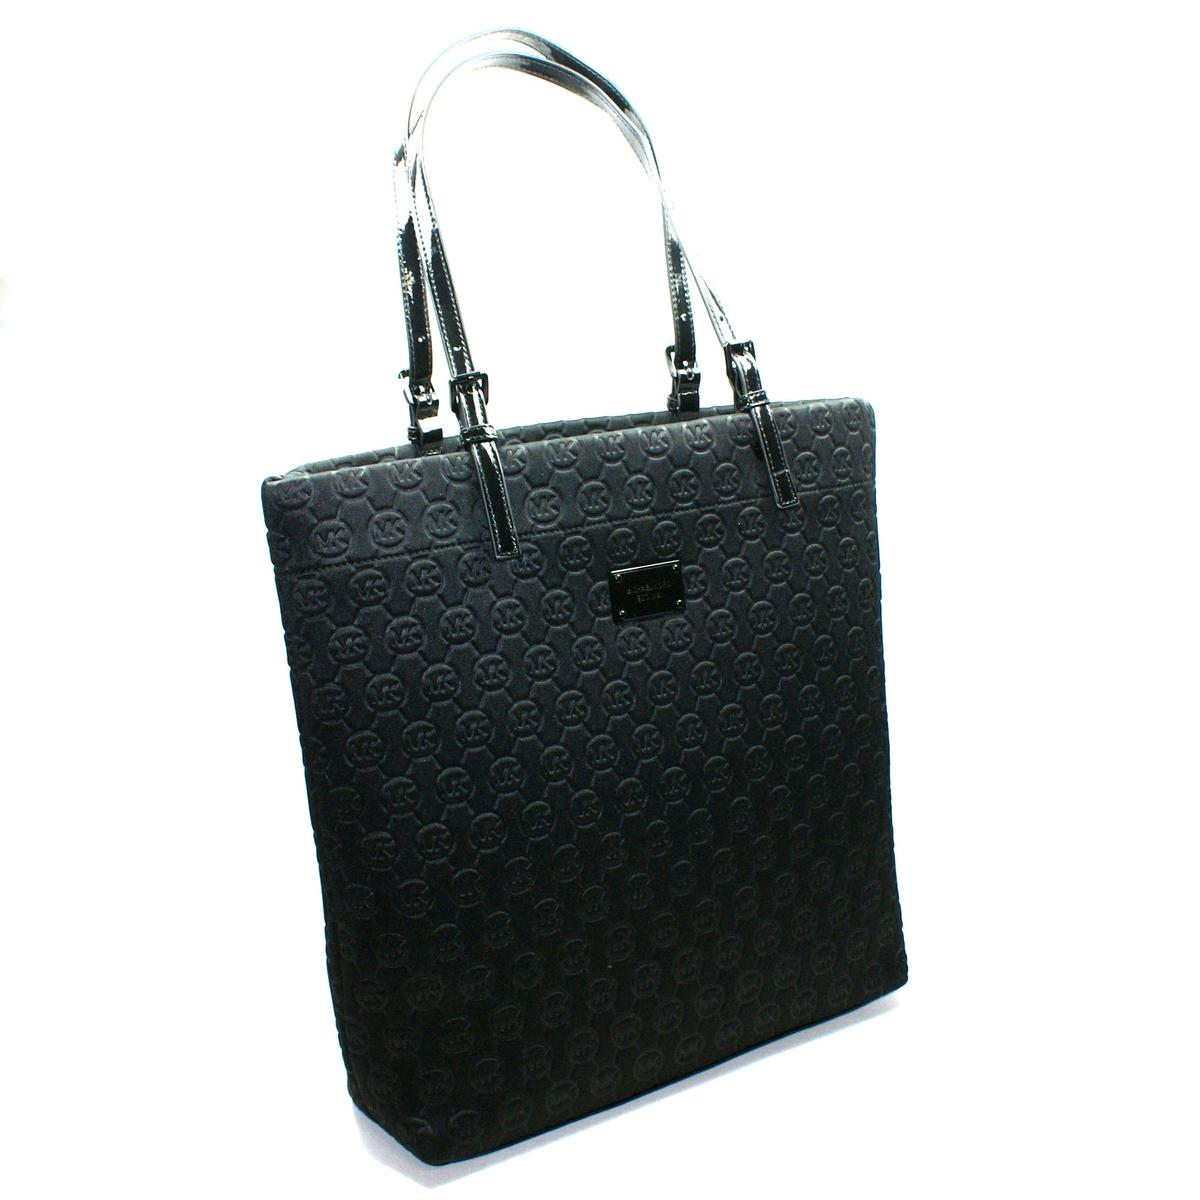 93fb105b2931 Home · Michael Kors · Neoprene Black Jet Set Tote Bag. CLICK THUMBNAIL TO  ZOOM. Found In: Handbags